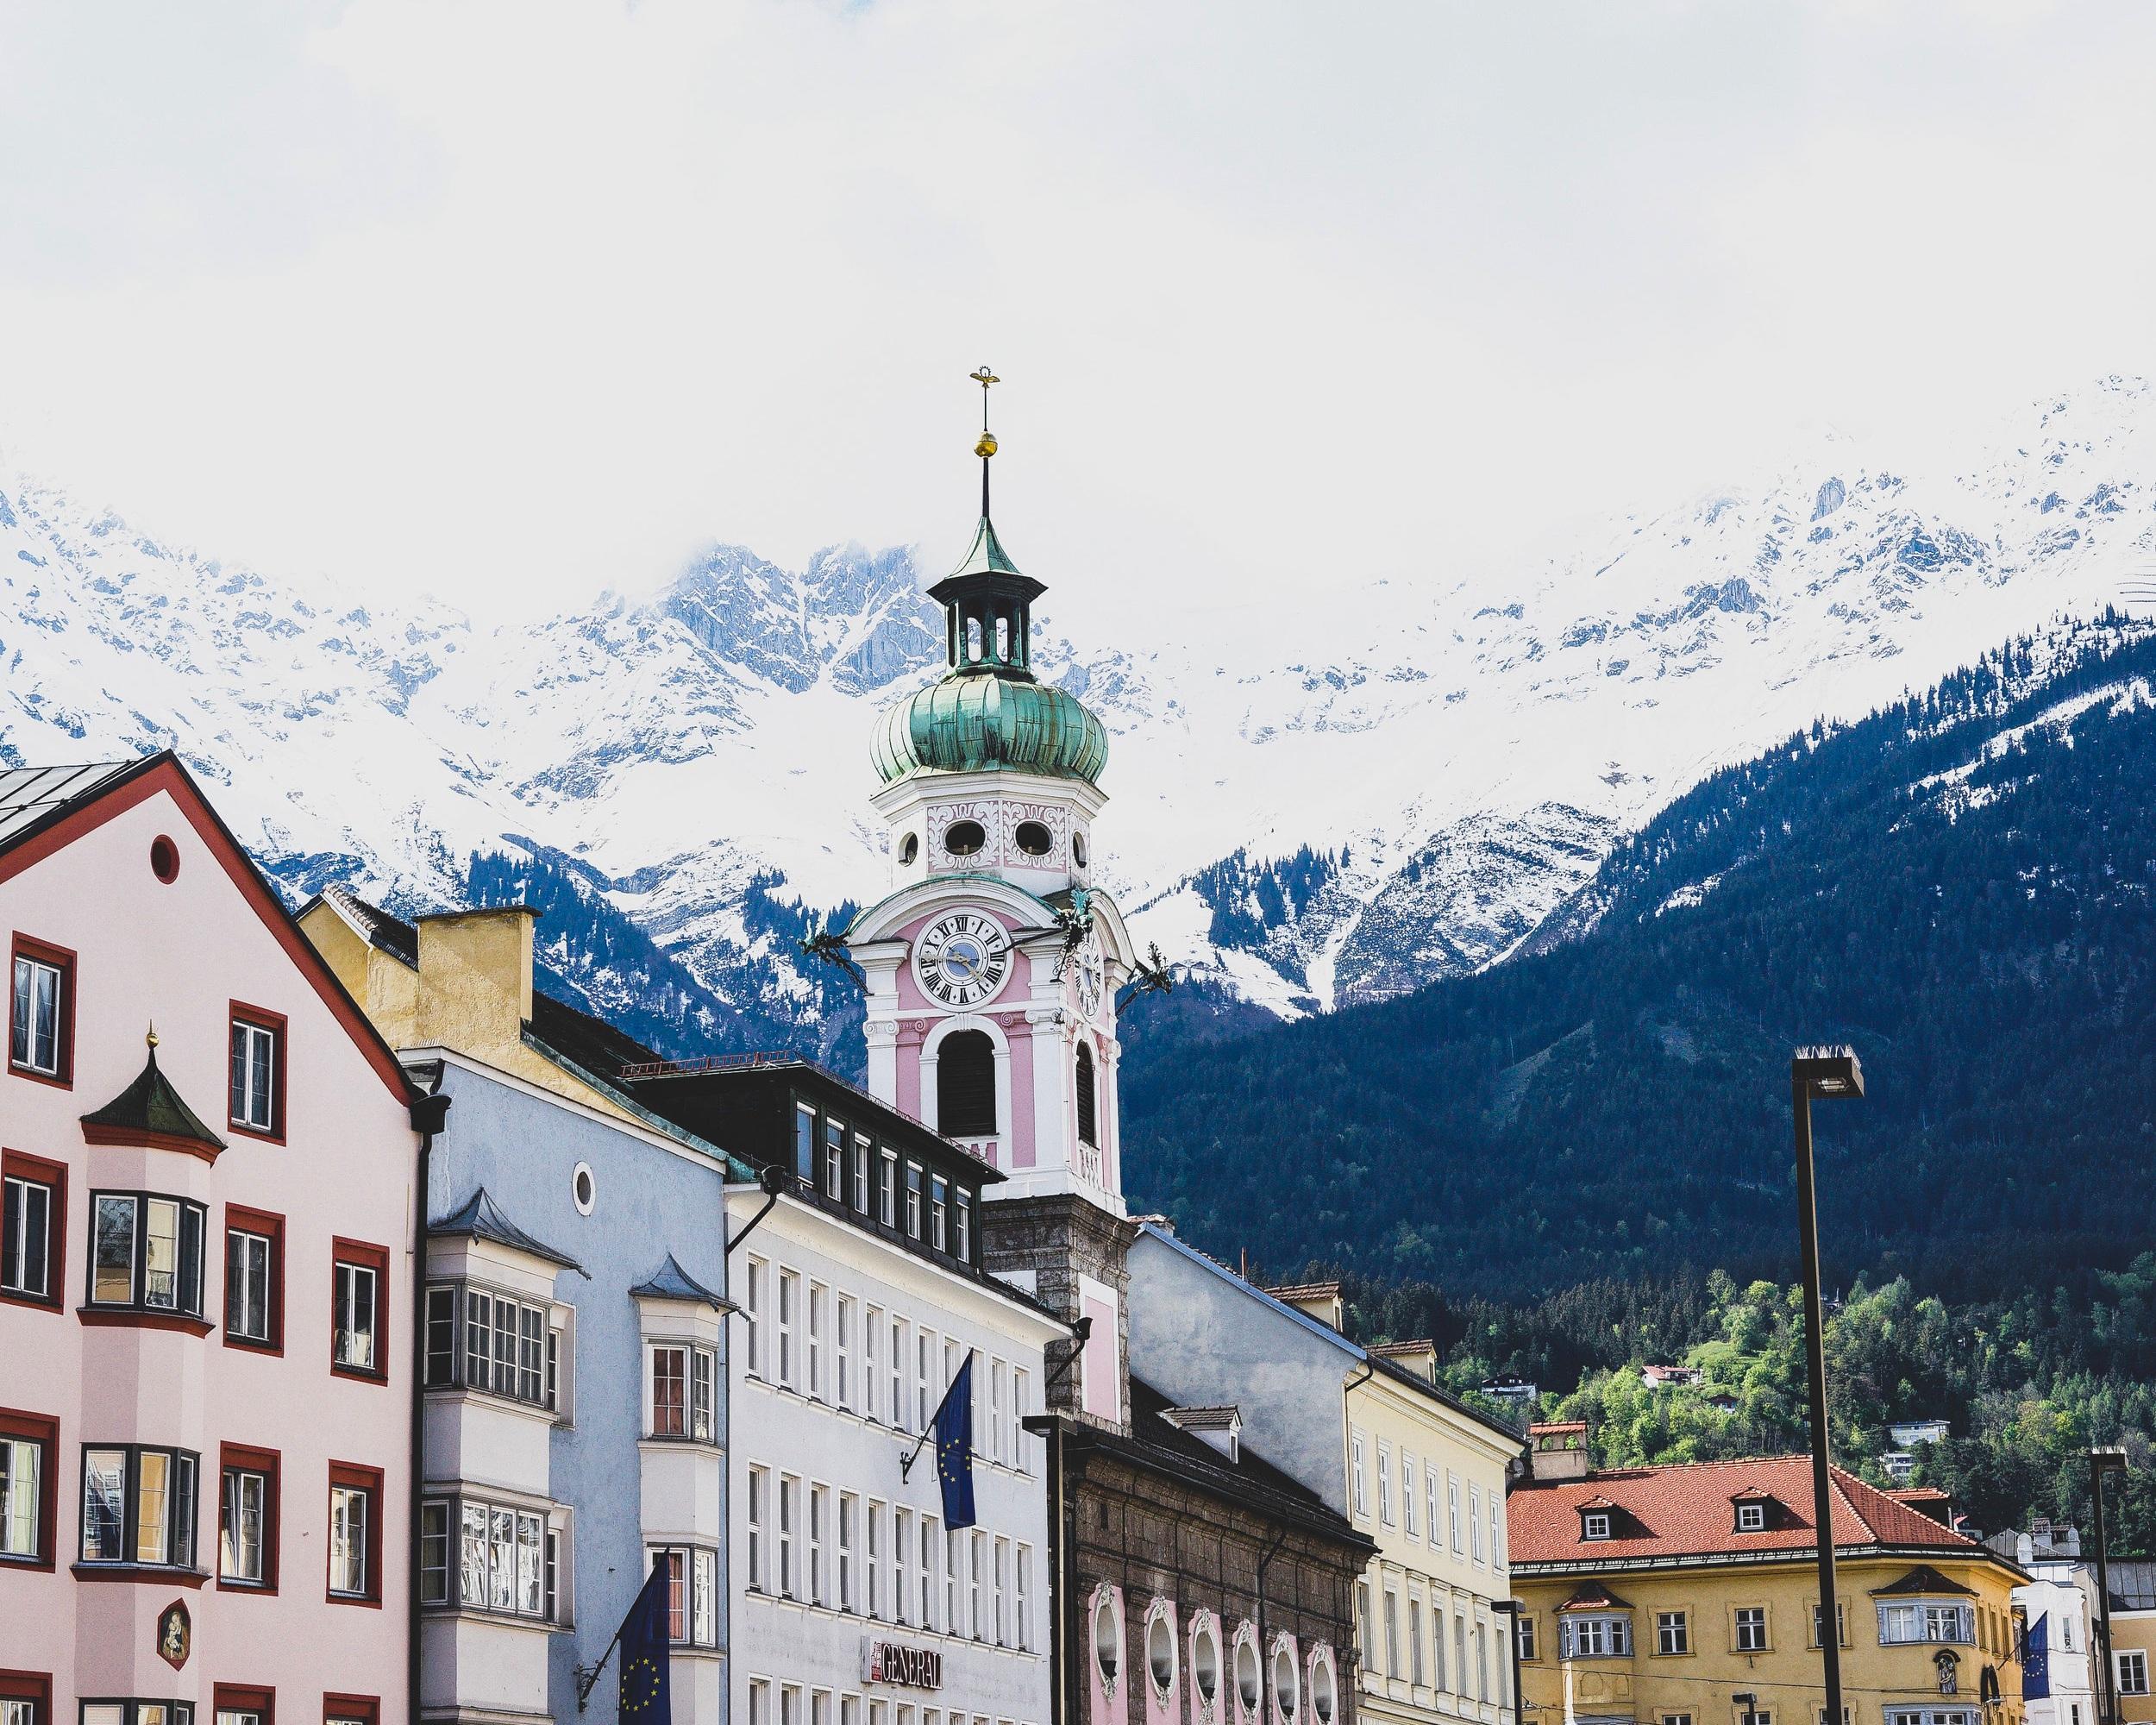 Third Stop: Innsbruck, Austria - Old Town